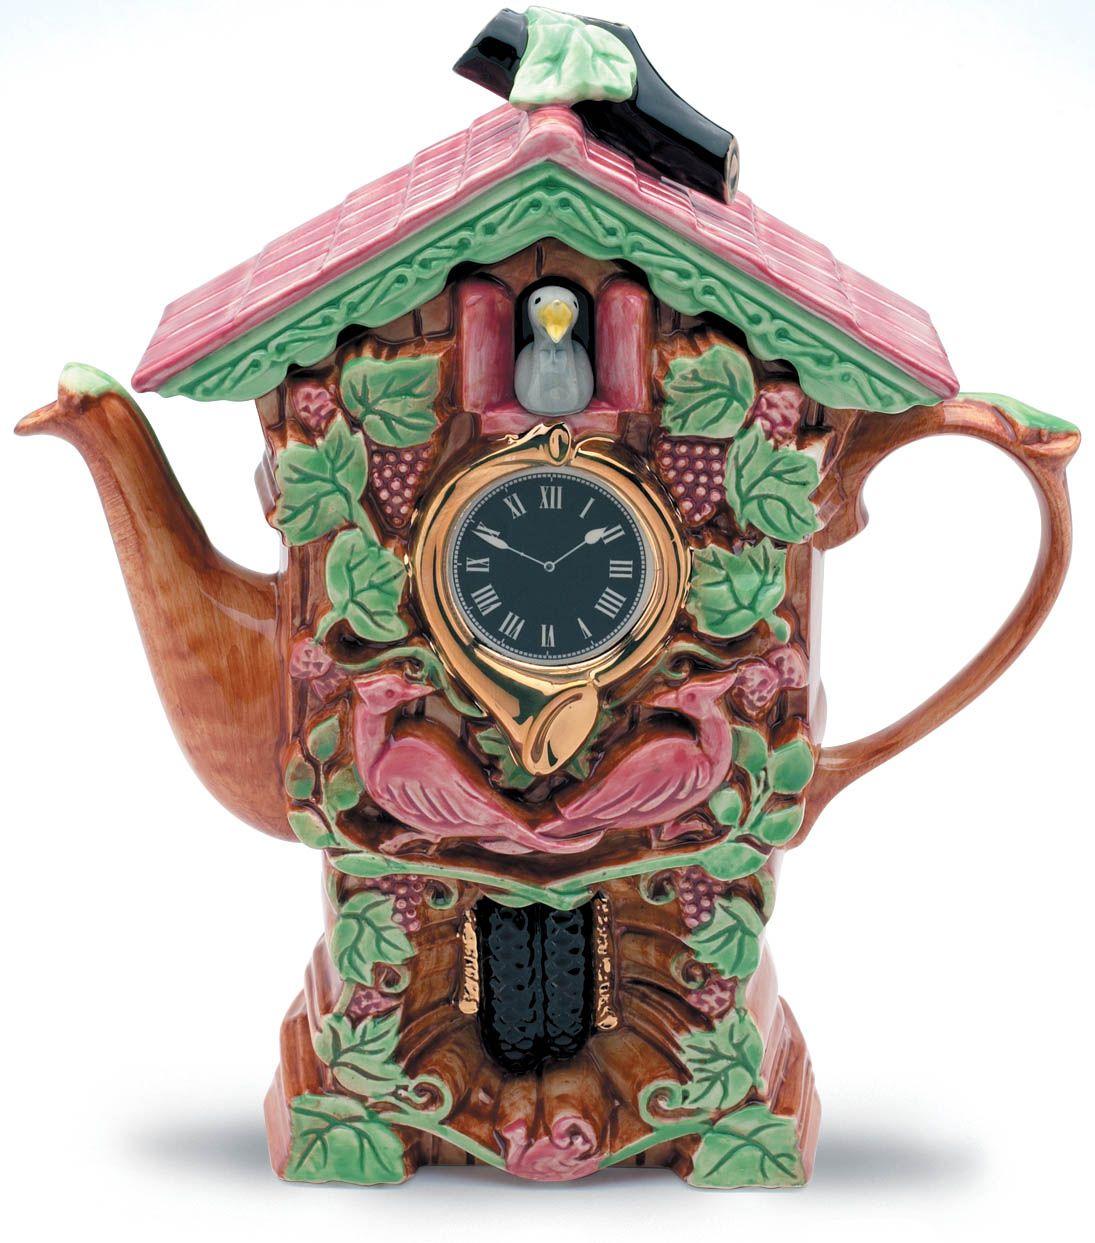 Cuckoo Cuckoo. The Cuckoo Clock Teapot. There's always time for tea.